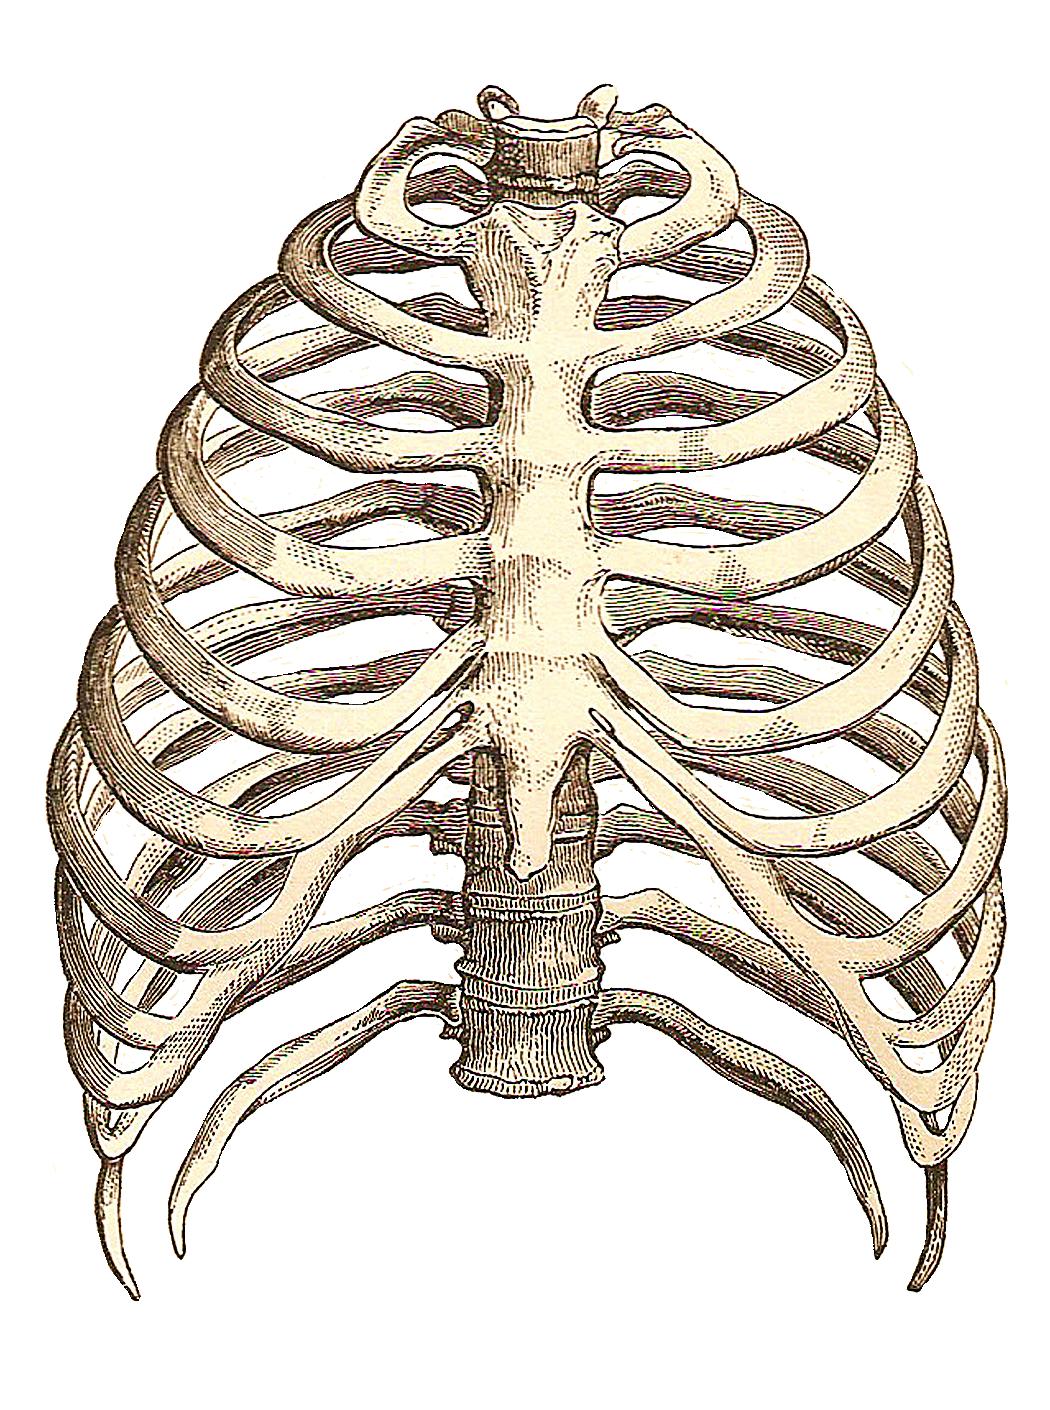 1050x1410 Rib Cage Drawing Inspiration. Rib Cage, Anatomy